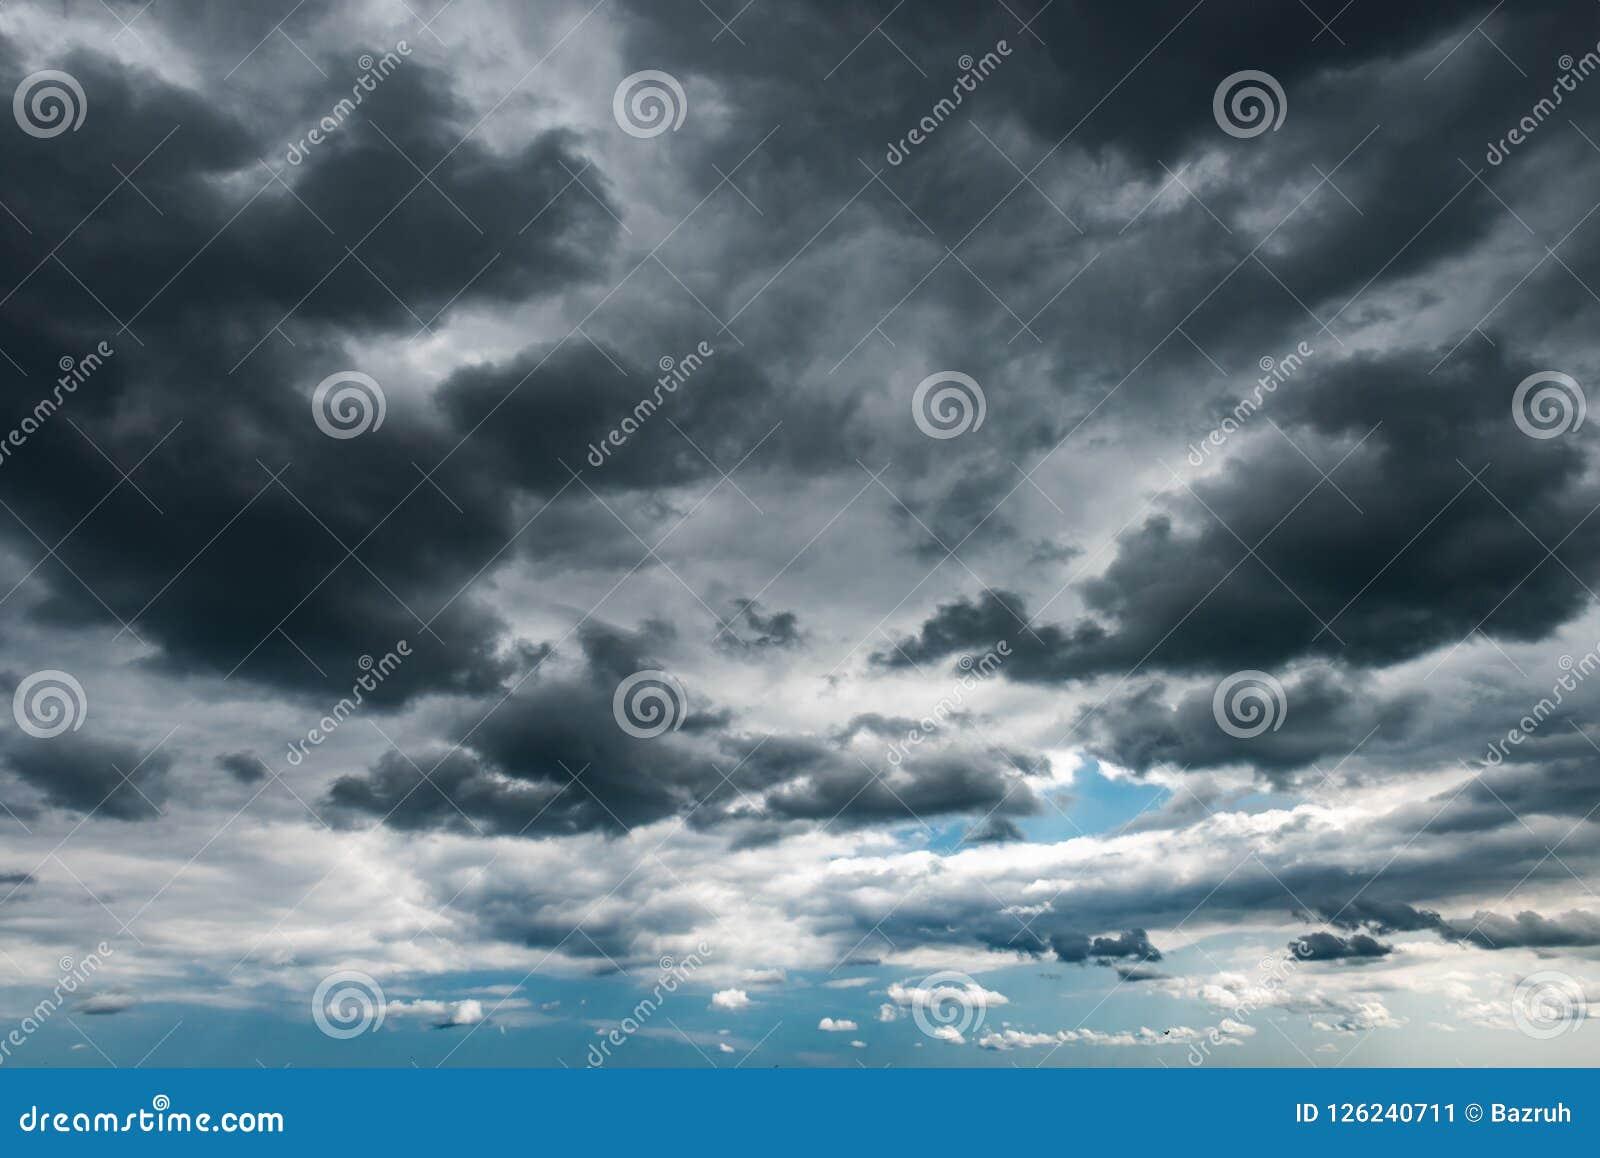 Donkere onweerswolken op de hemel